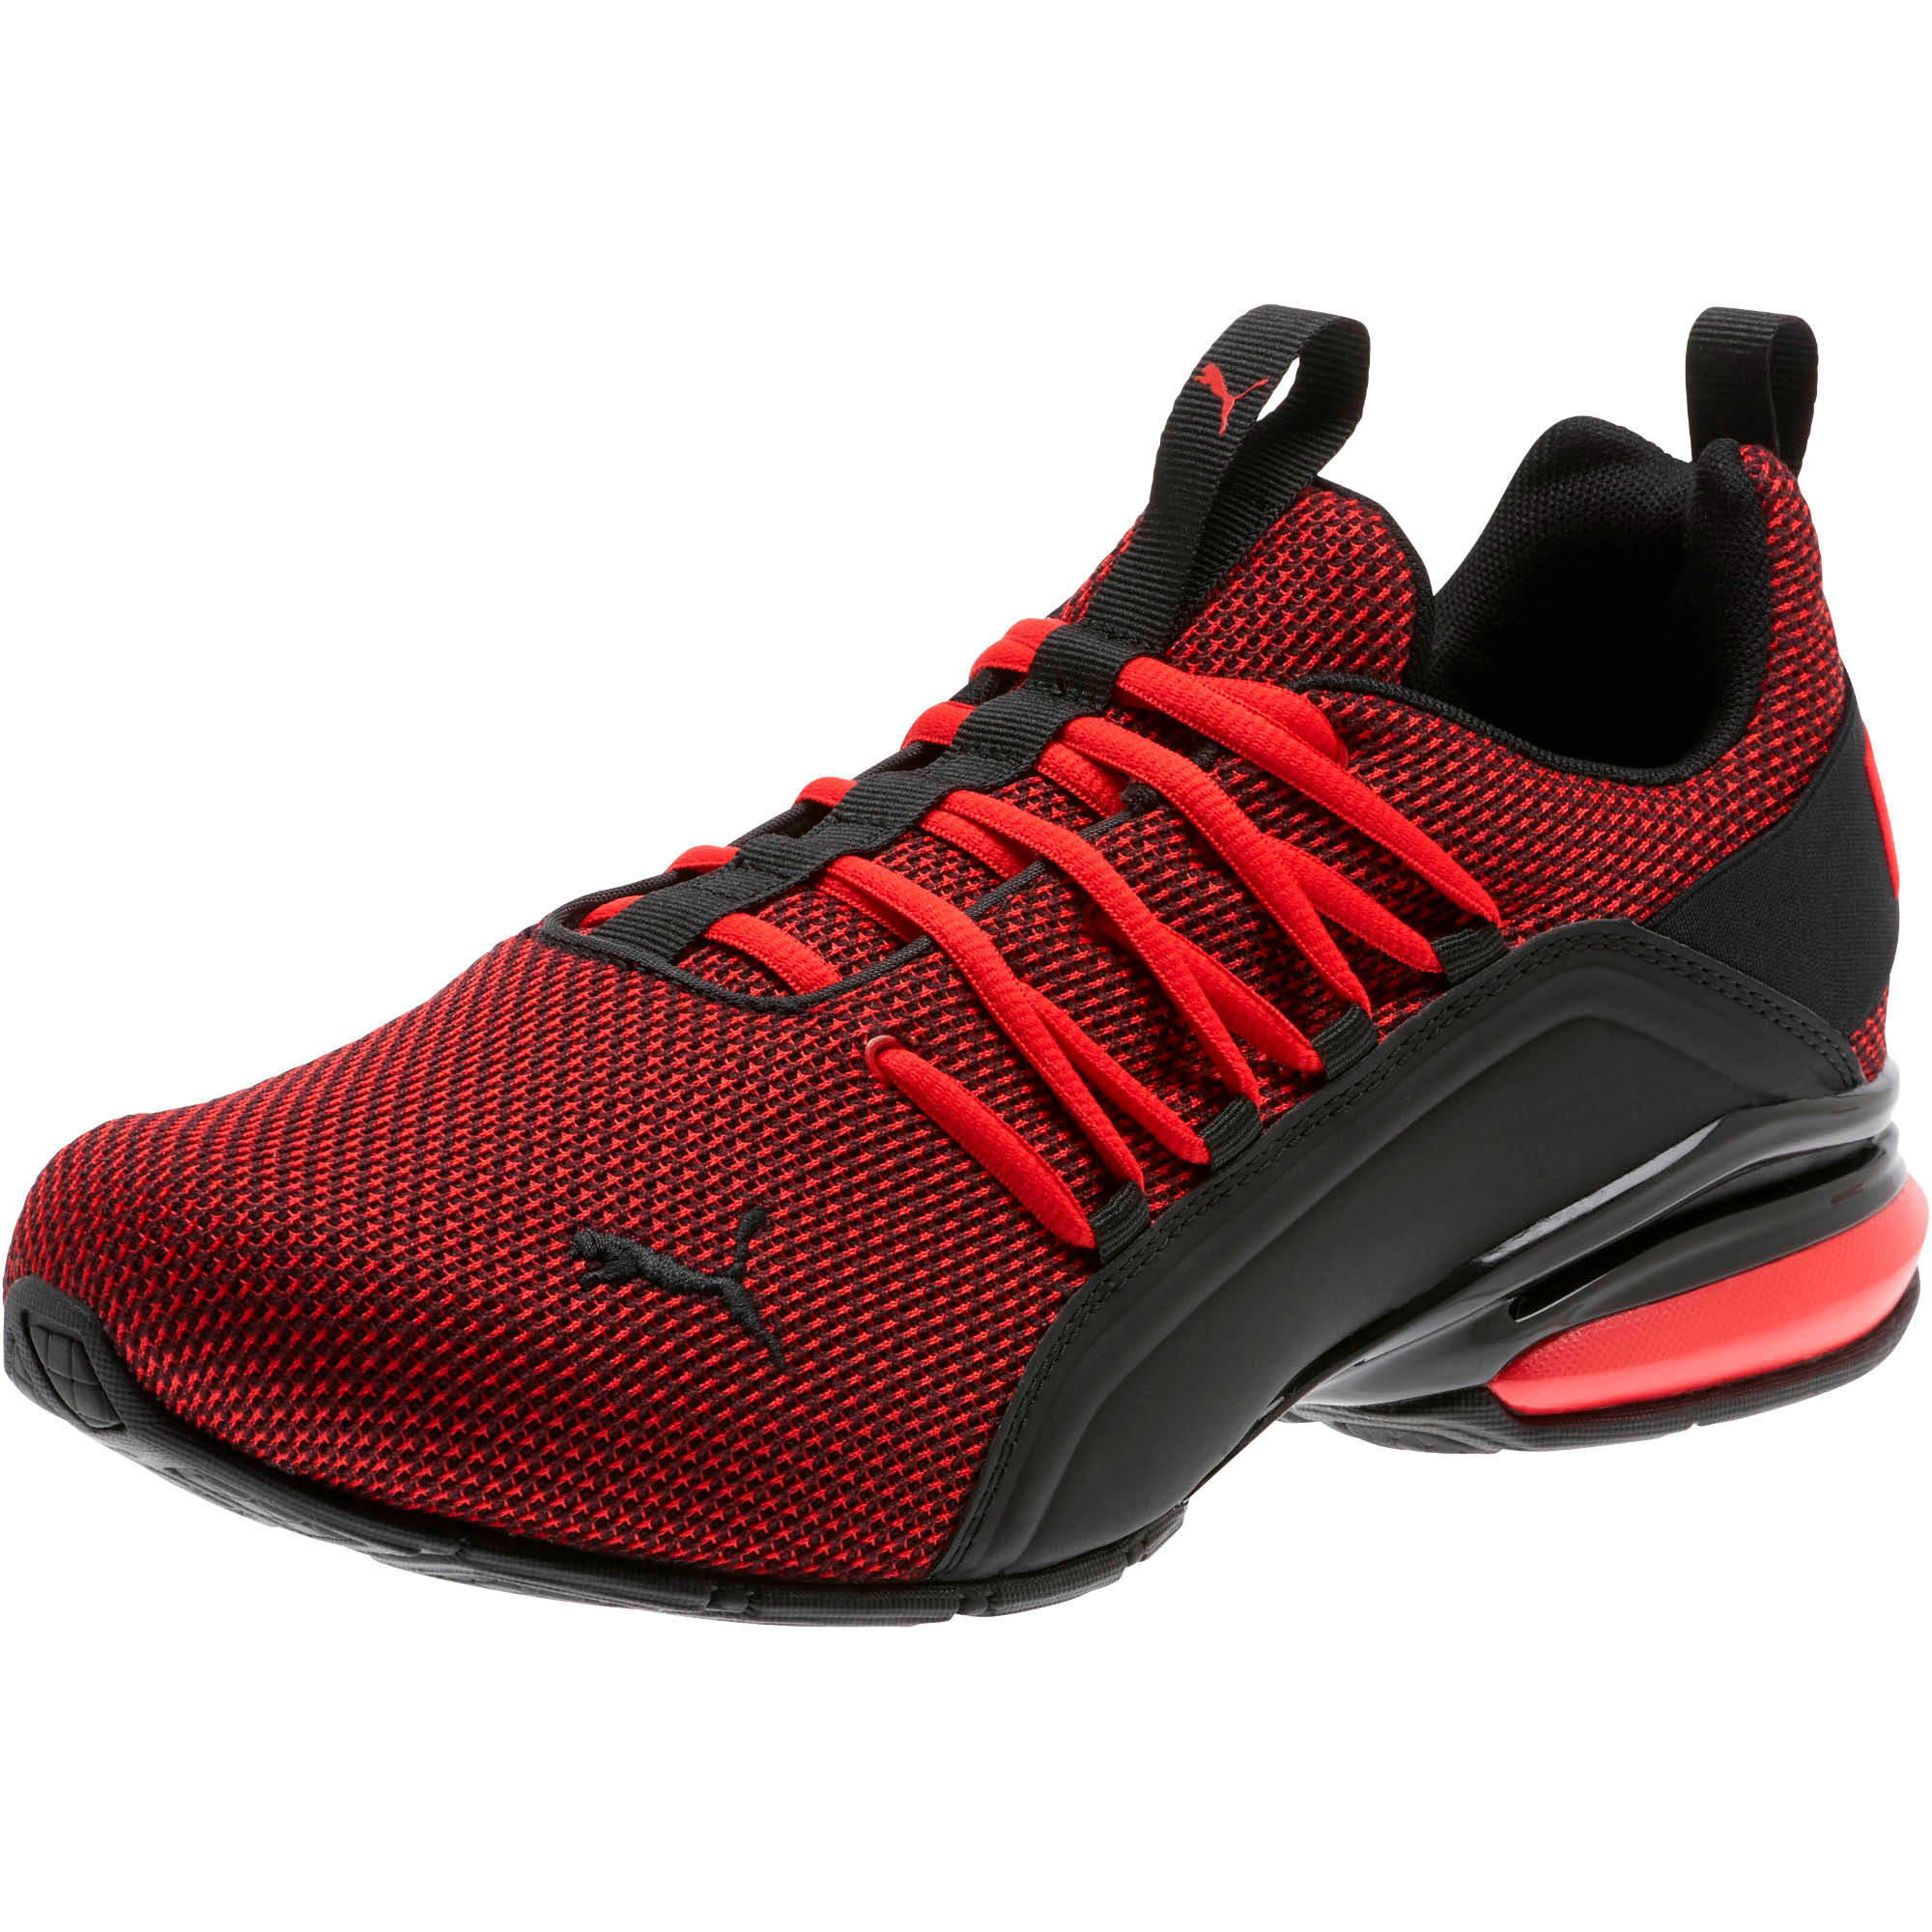 Thumbnail 1 of Axelion Mesh Wide Men's Training Shoes, High Risk Red-Puma Black, medium